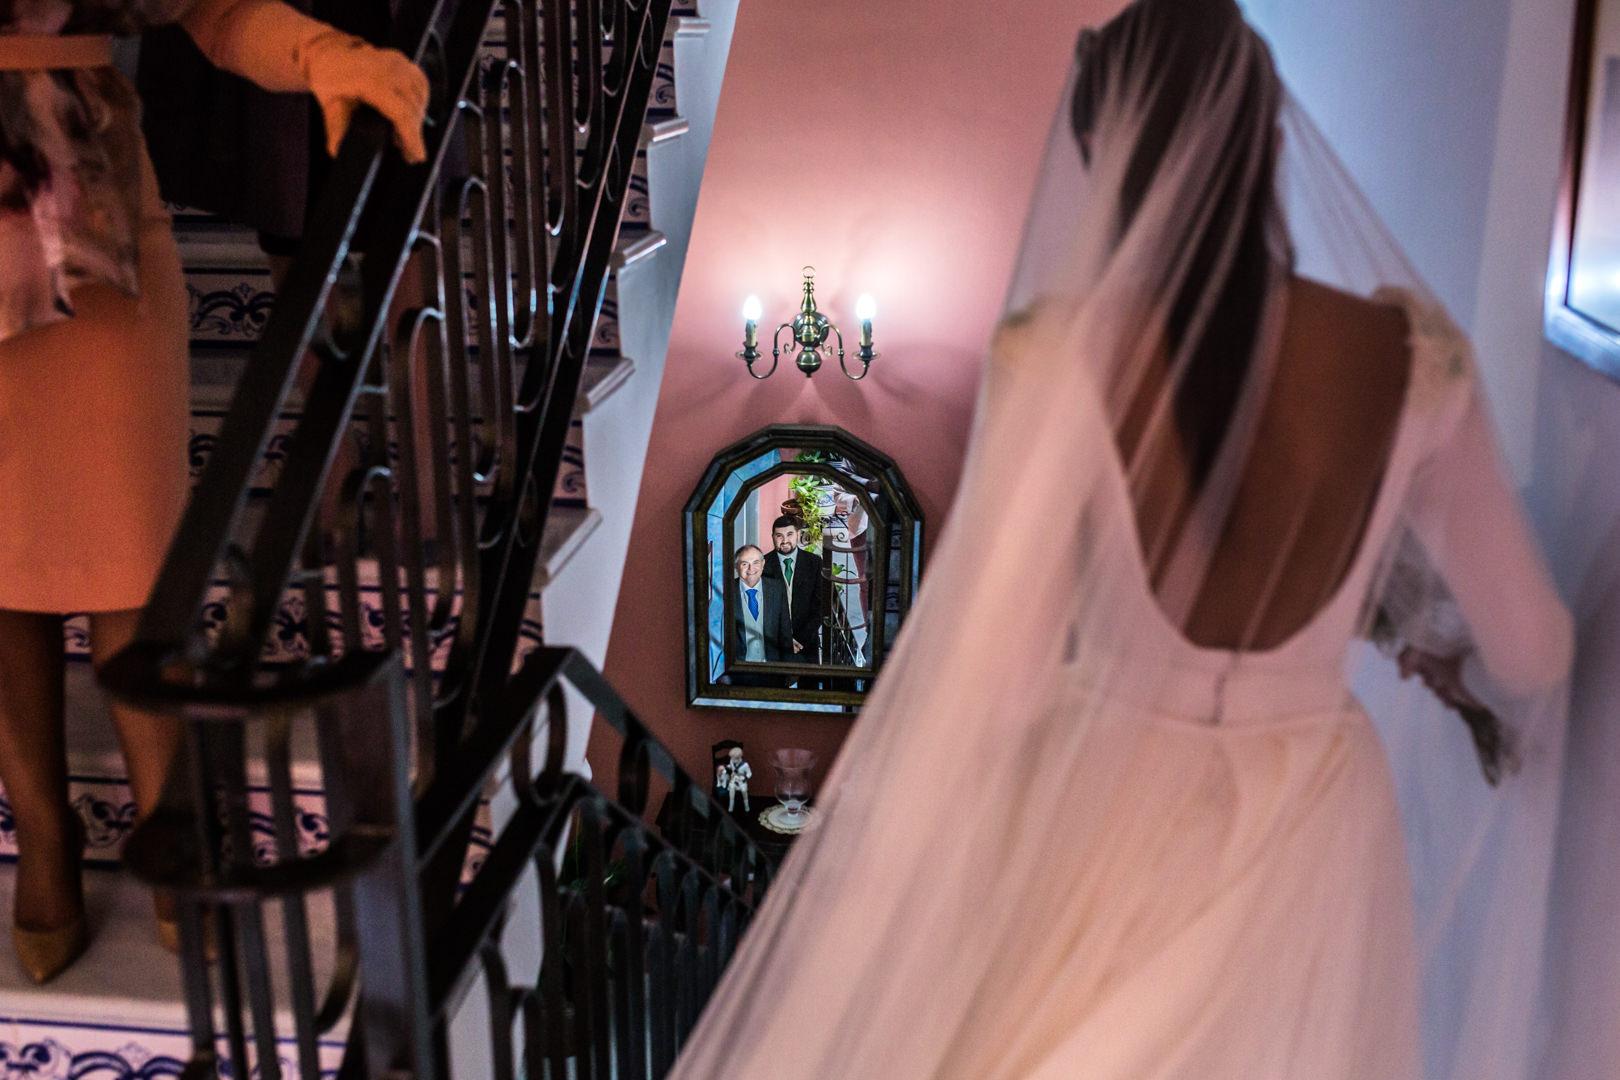 Boda-sevilla-Wedding-engagement-Rafael-Torres-fotografo-bodas-sevilla-madrid-barcelona-wedding-photographer--25.jpg